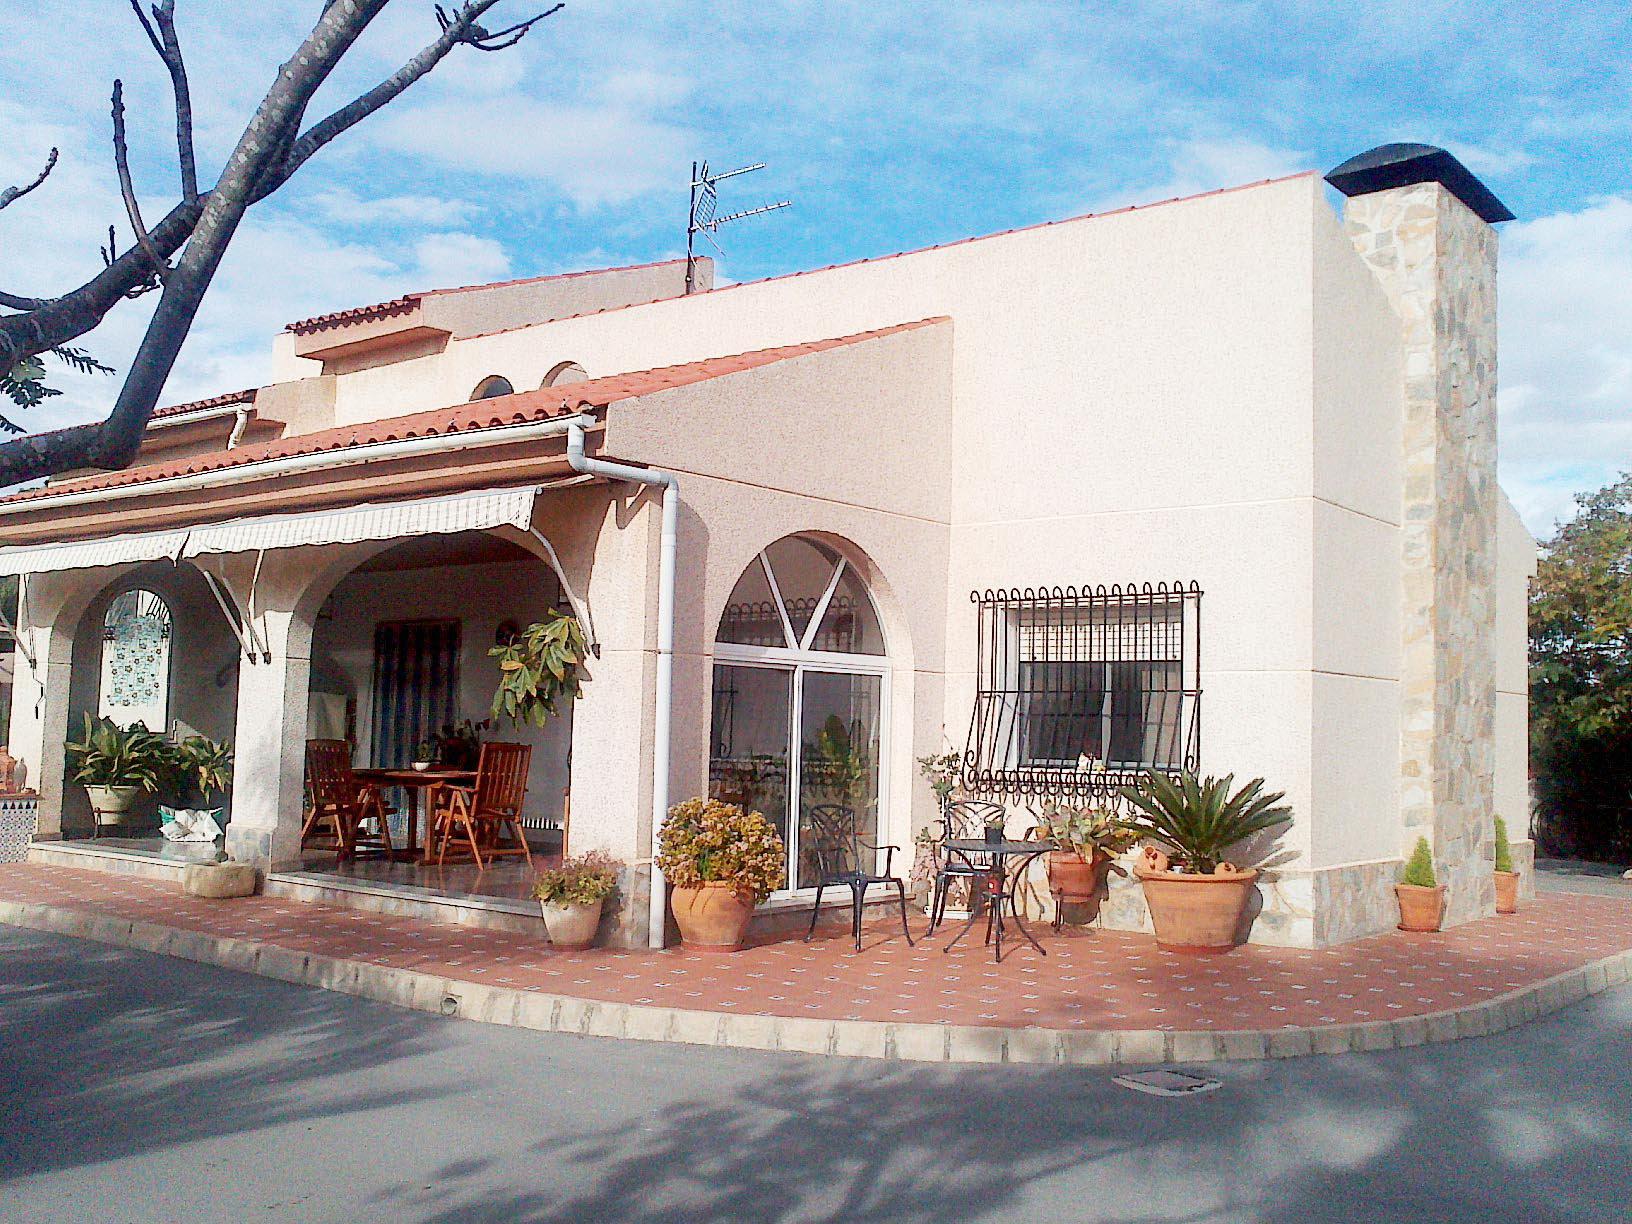 Property For Sale Elche | Villa in Elche